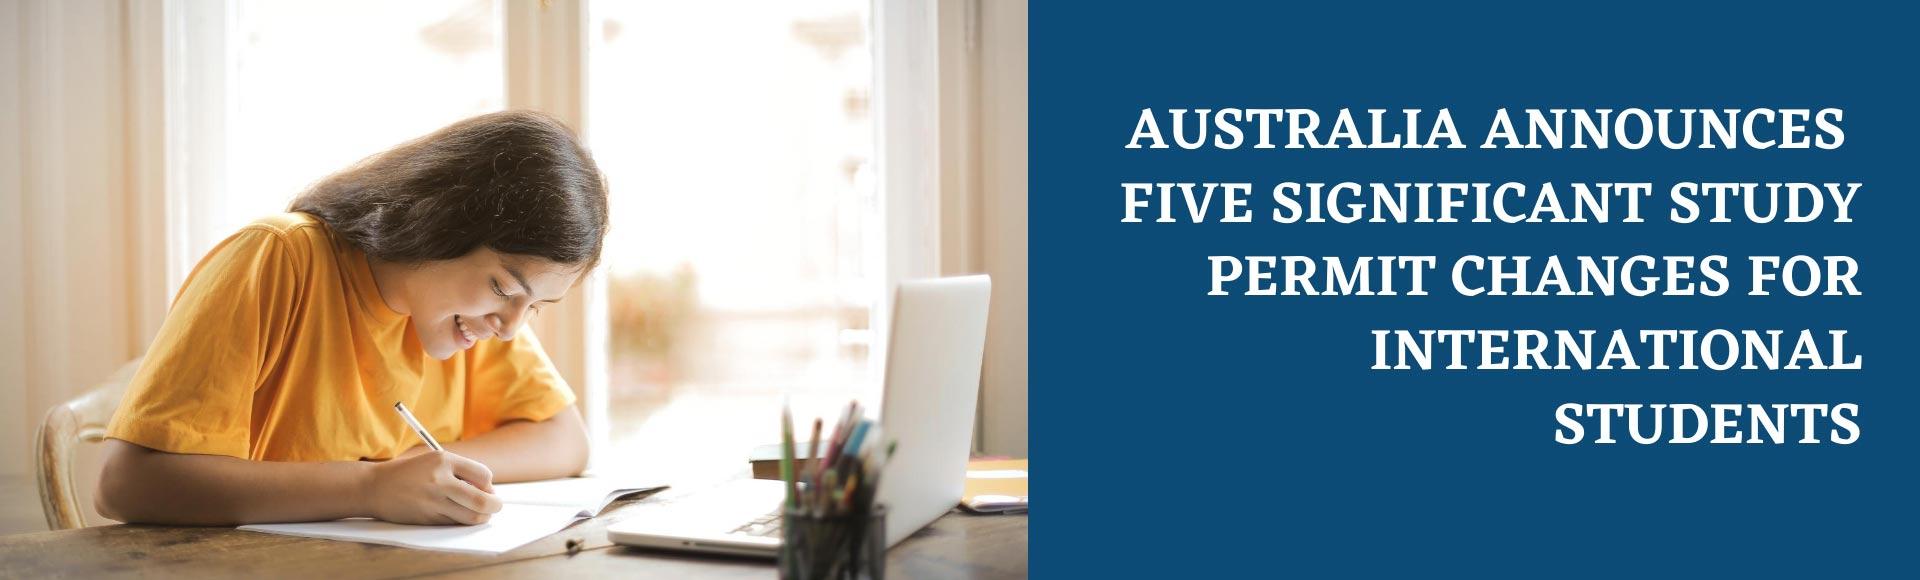 Australia announces five significant study permit changes for International students